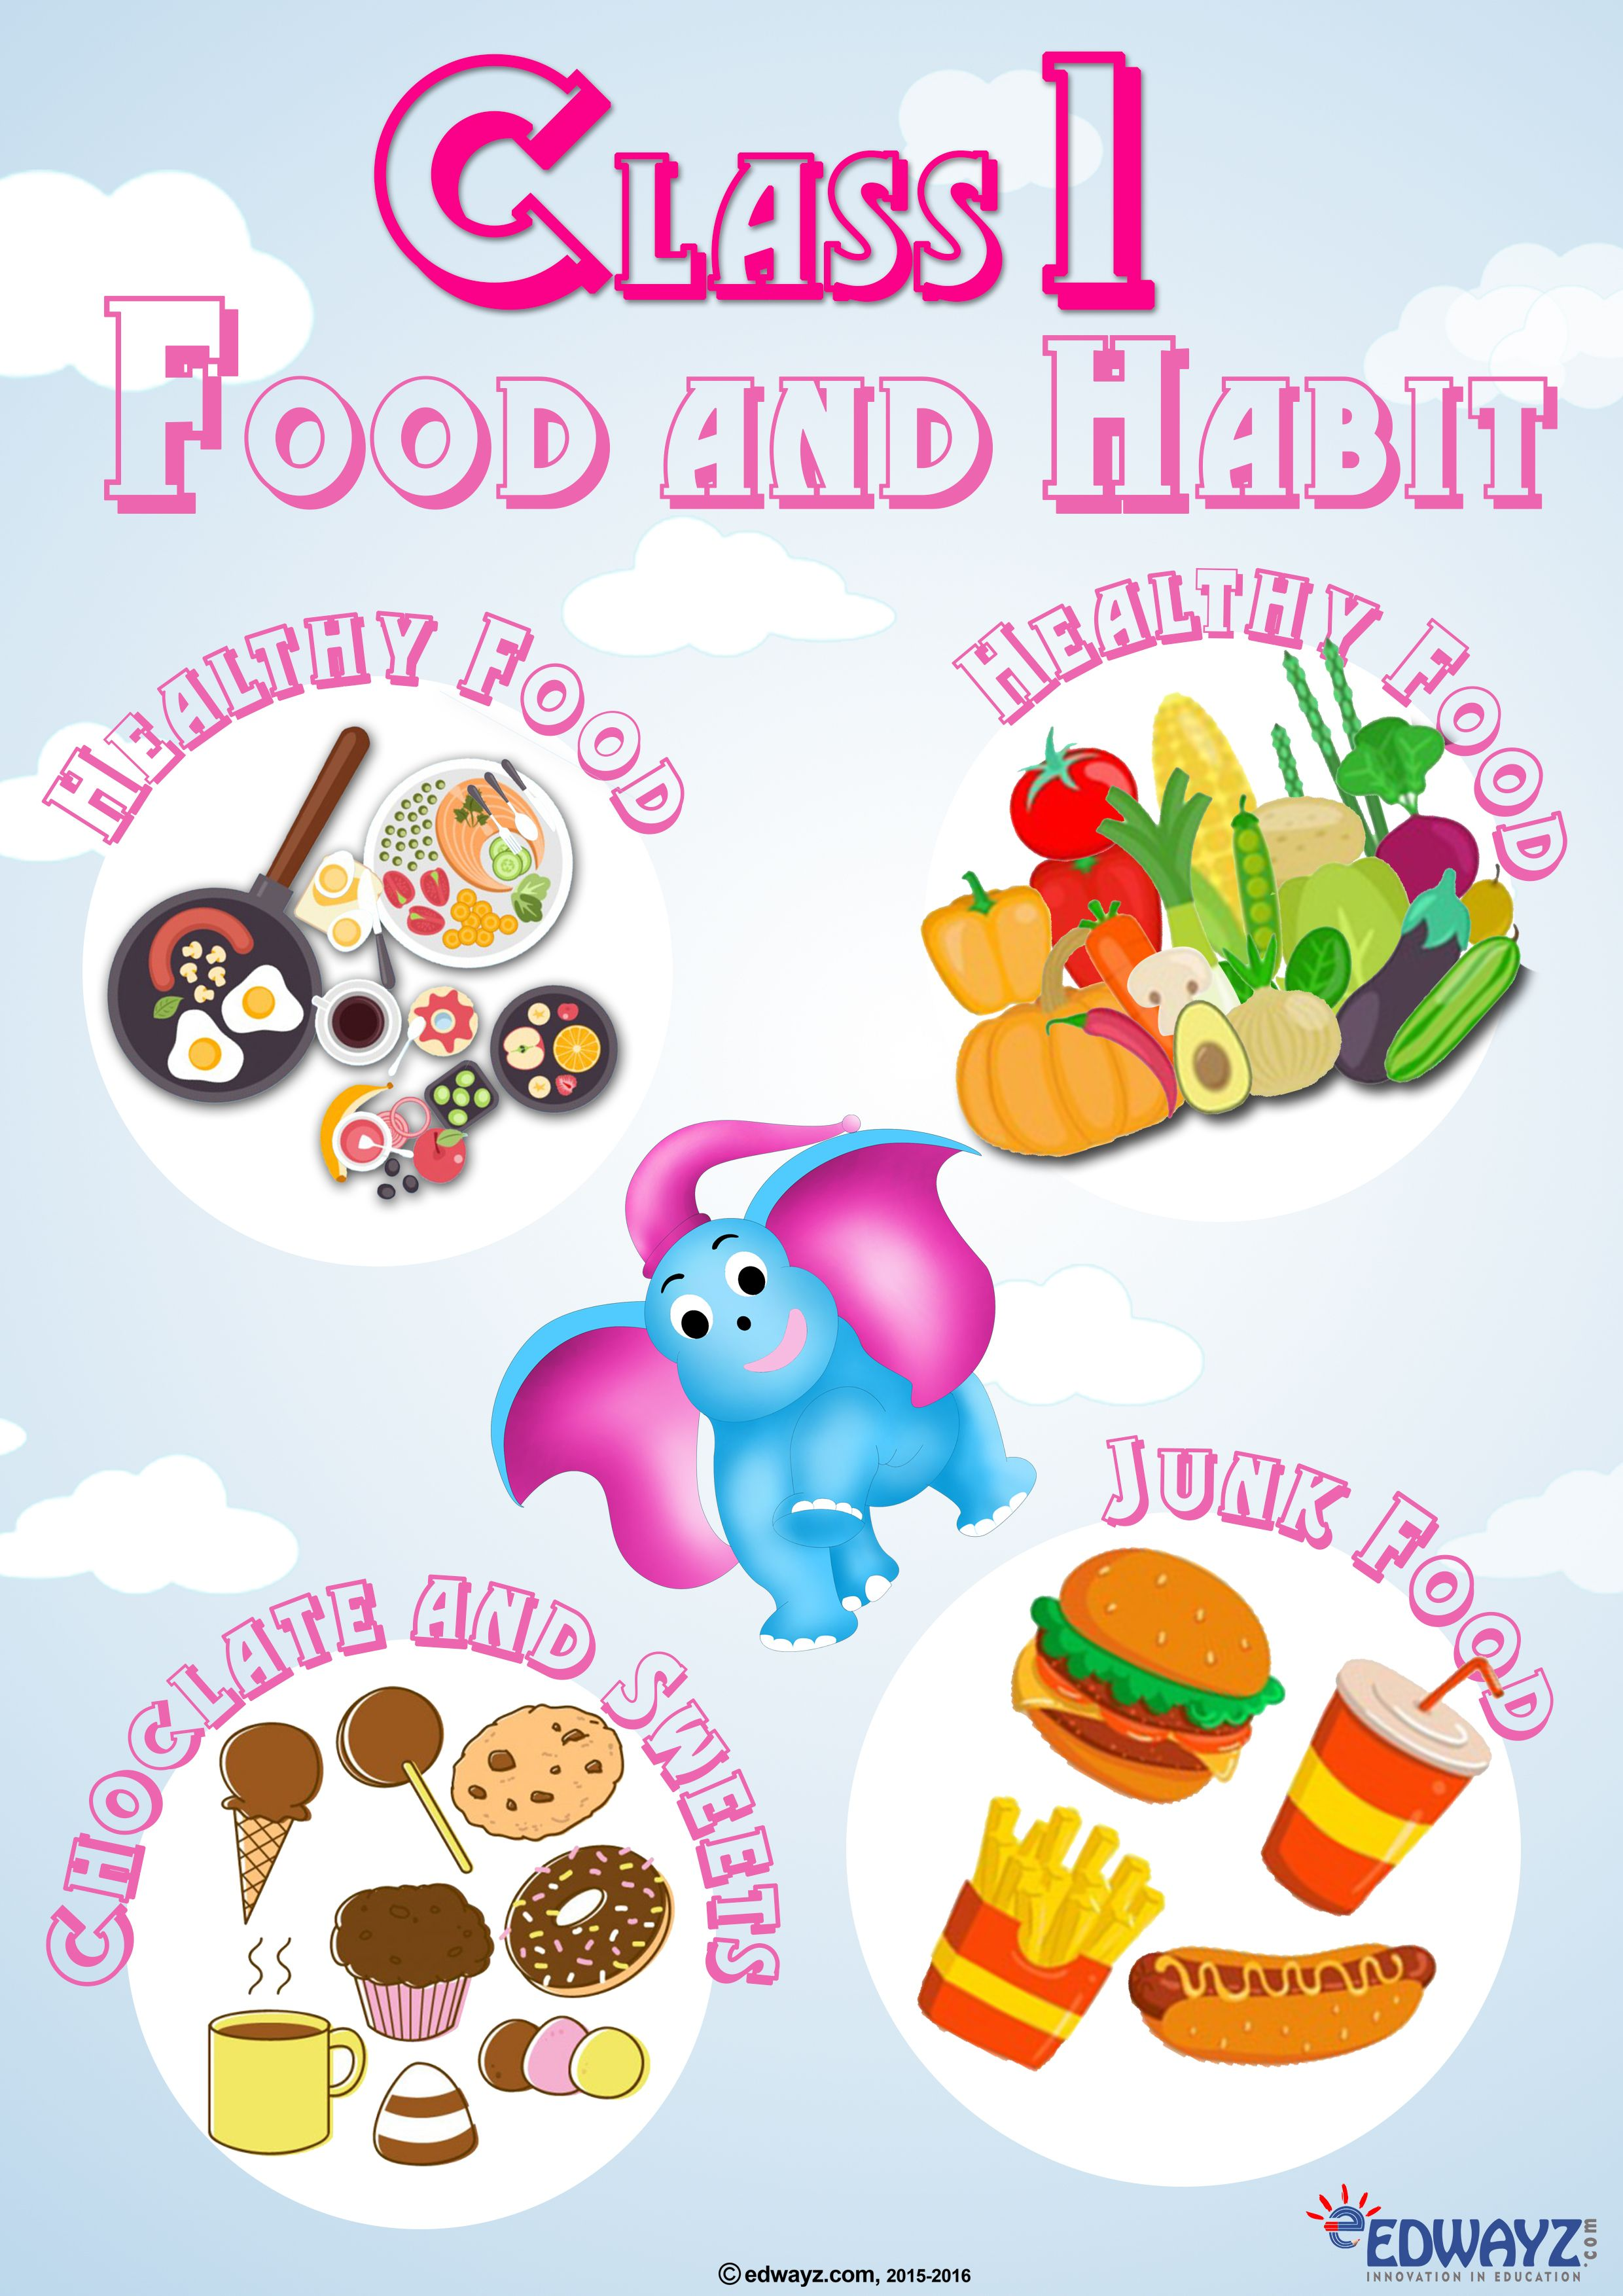 Worksheets_Class1_Food \u0026 habits   Worksheets for kids [ 3508 x 2480 Pixel ]